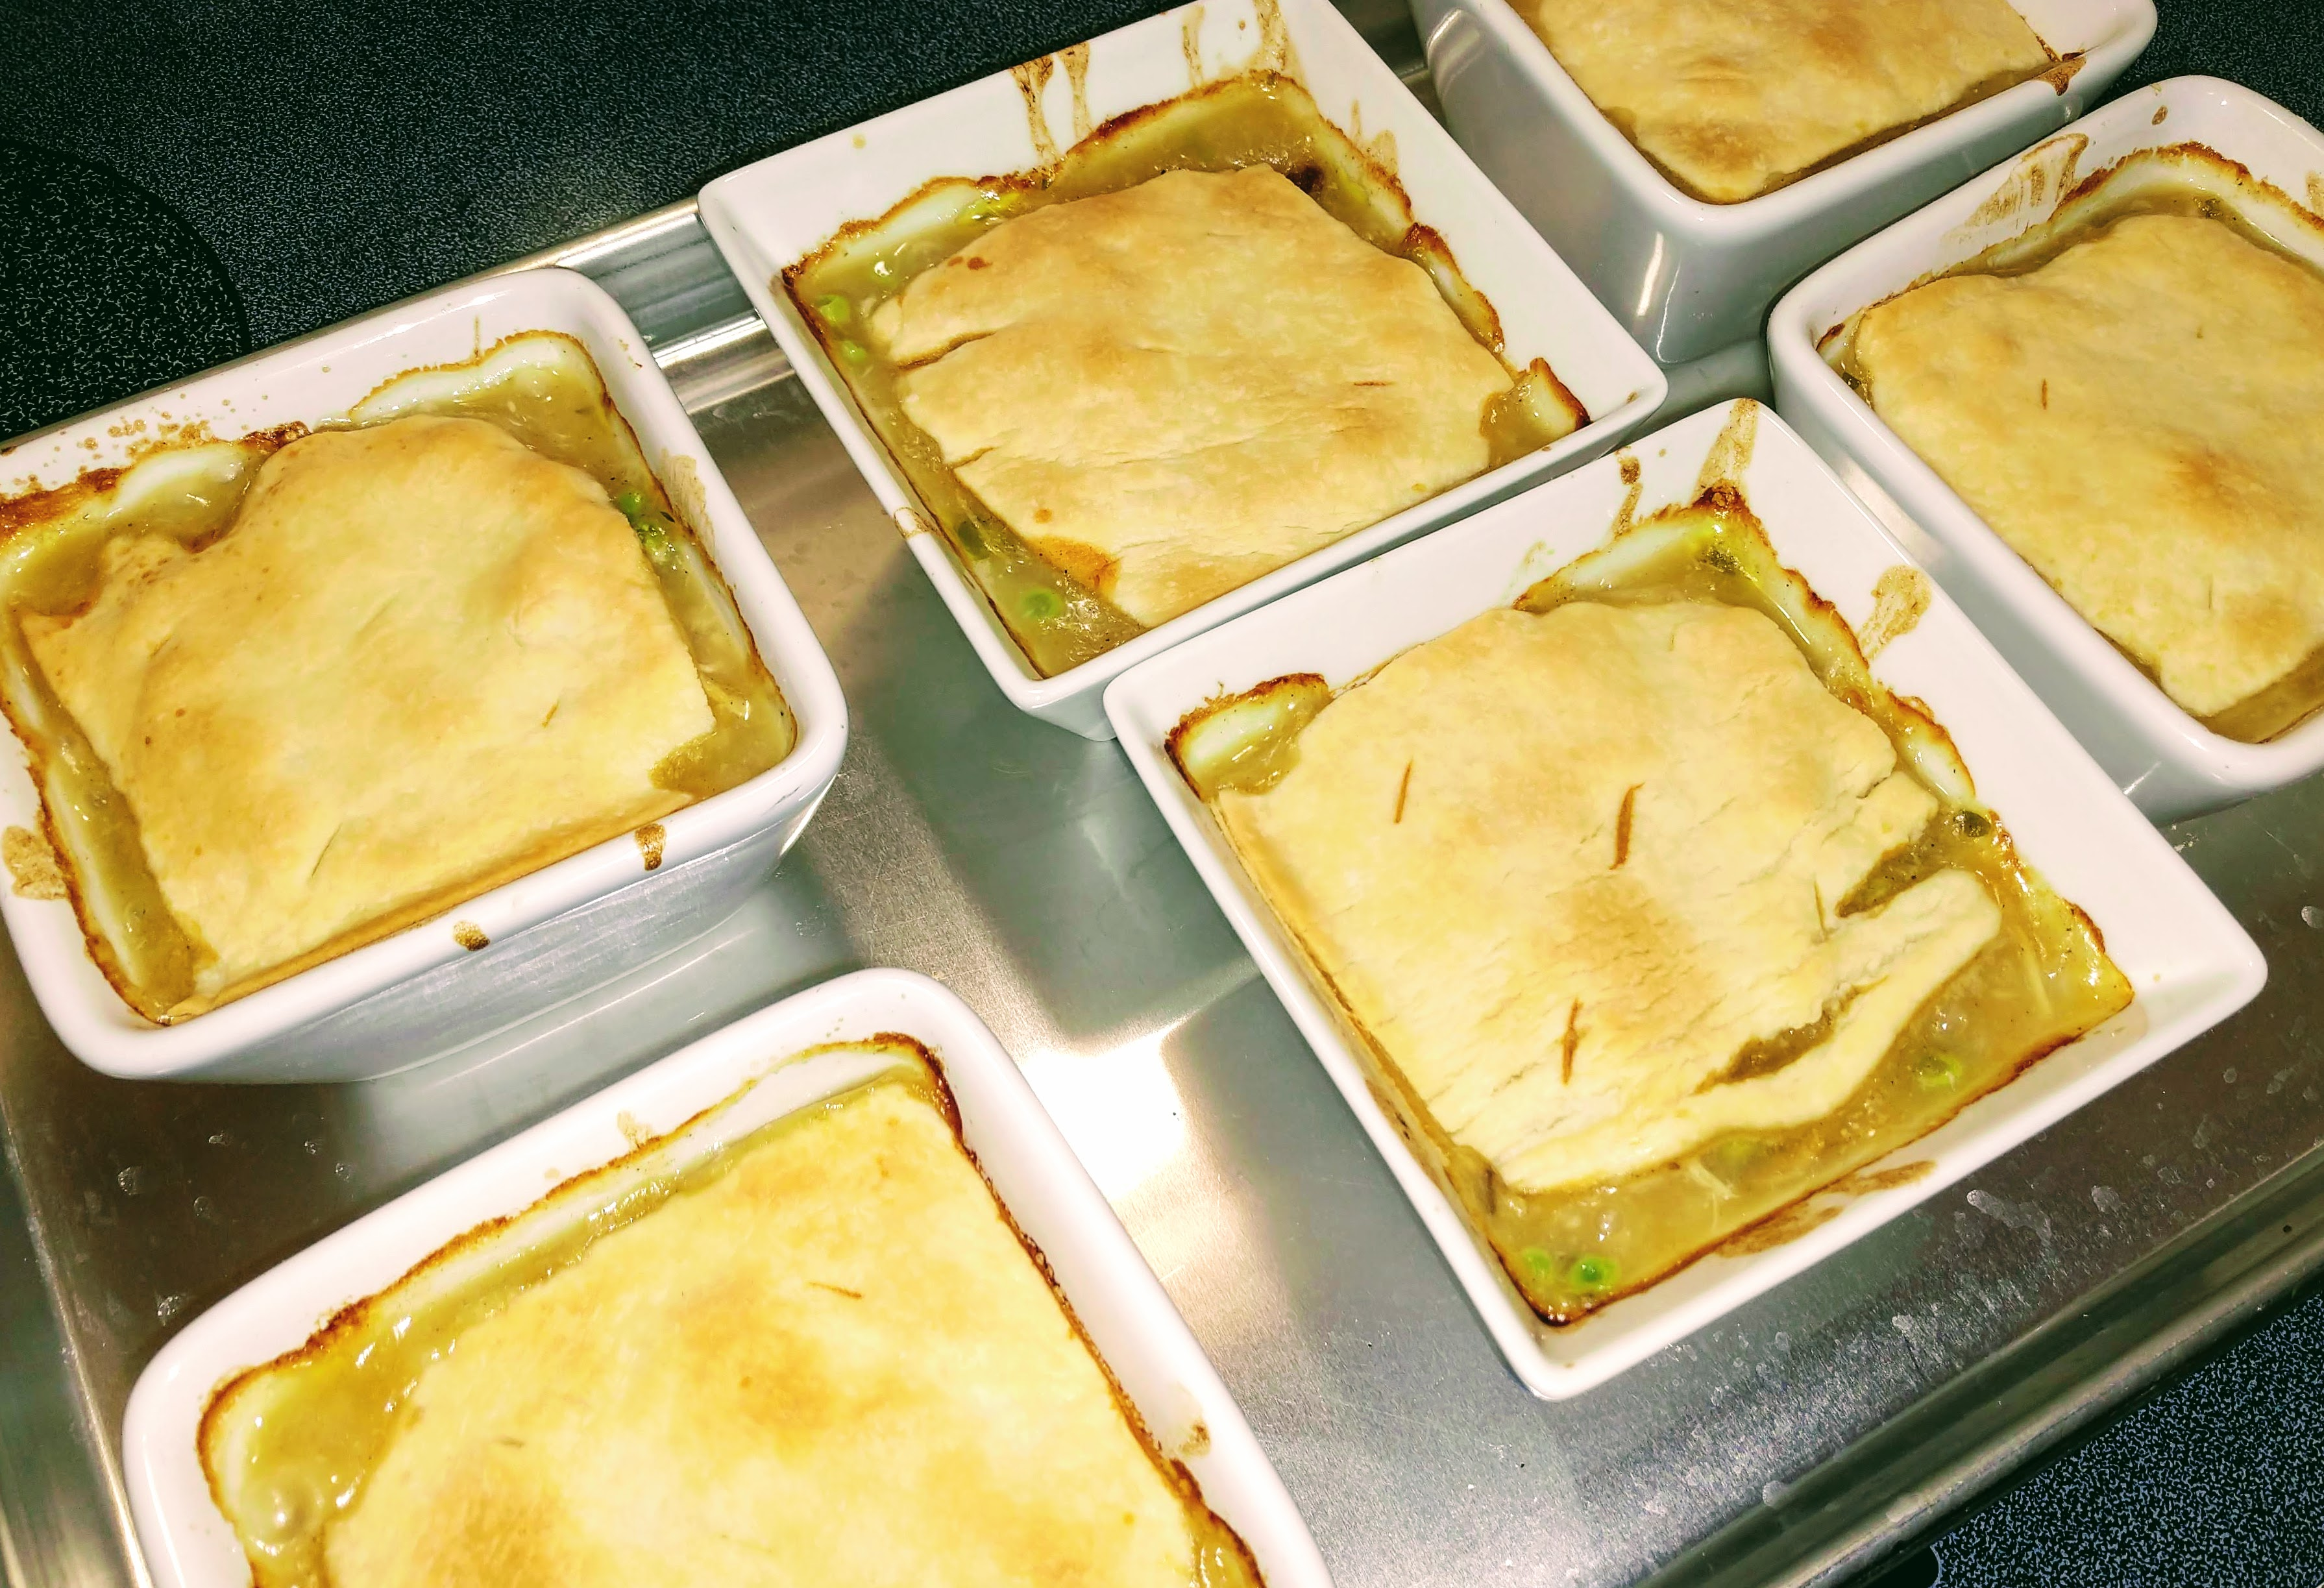 Catha's Individual Turkey Pot Pies